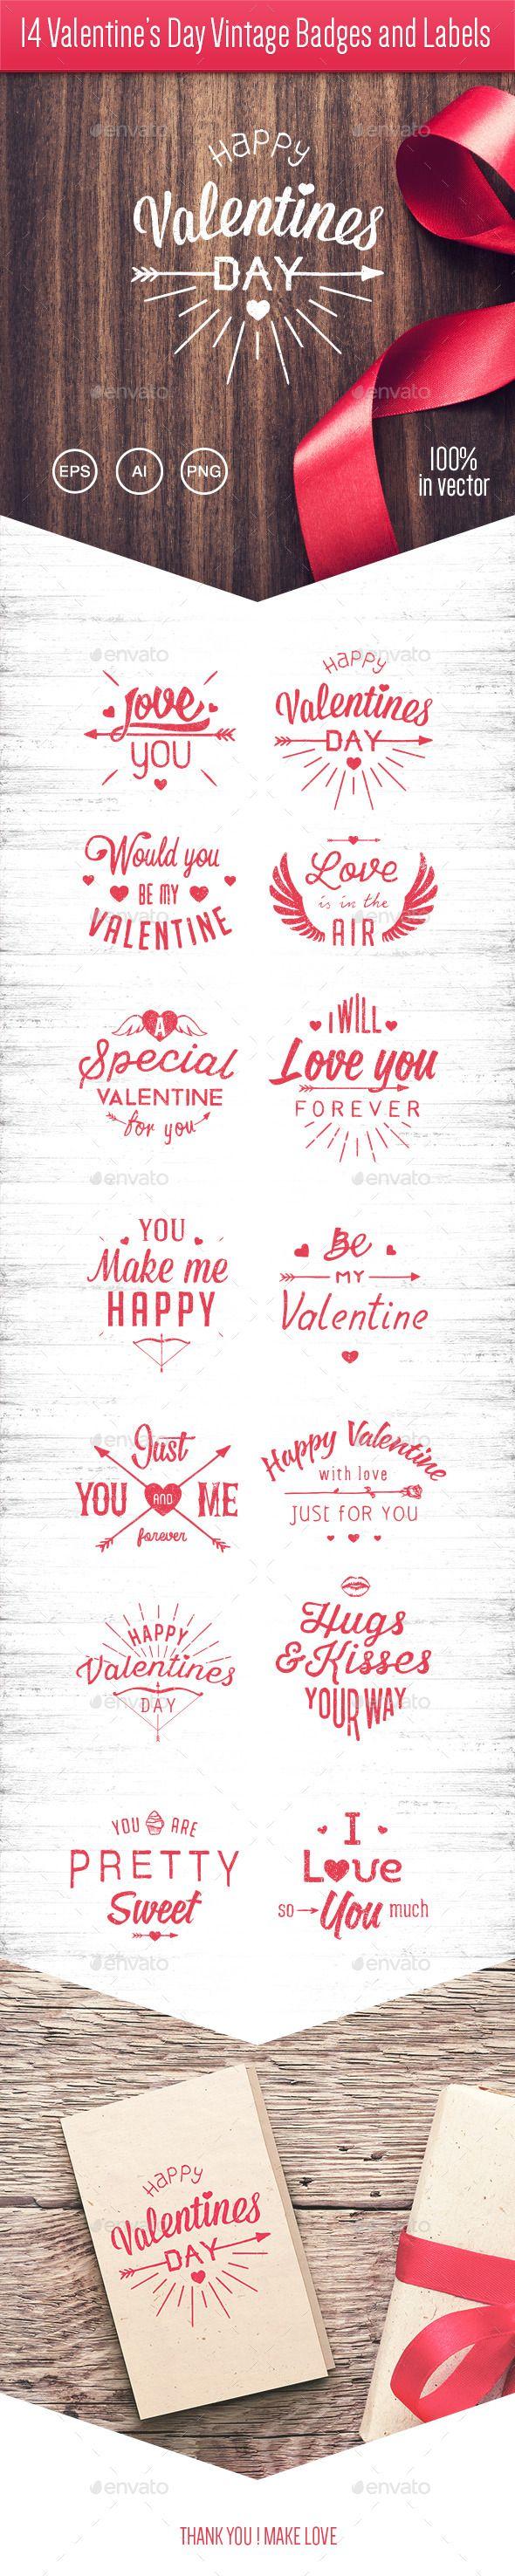 14 Valentine's Day Vintage Badges and Labels Vector Template #design Download: http://graphicriver.net/item/14-valentines-day-vintage-badges-and-labels/10227313?ref=ksioks